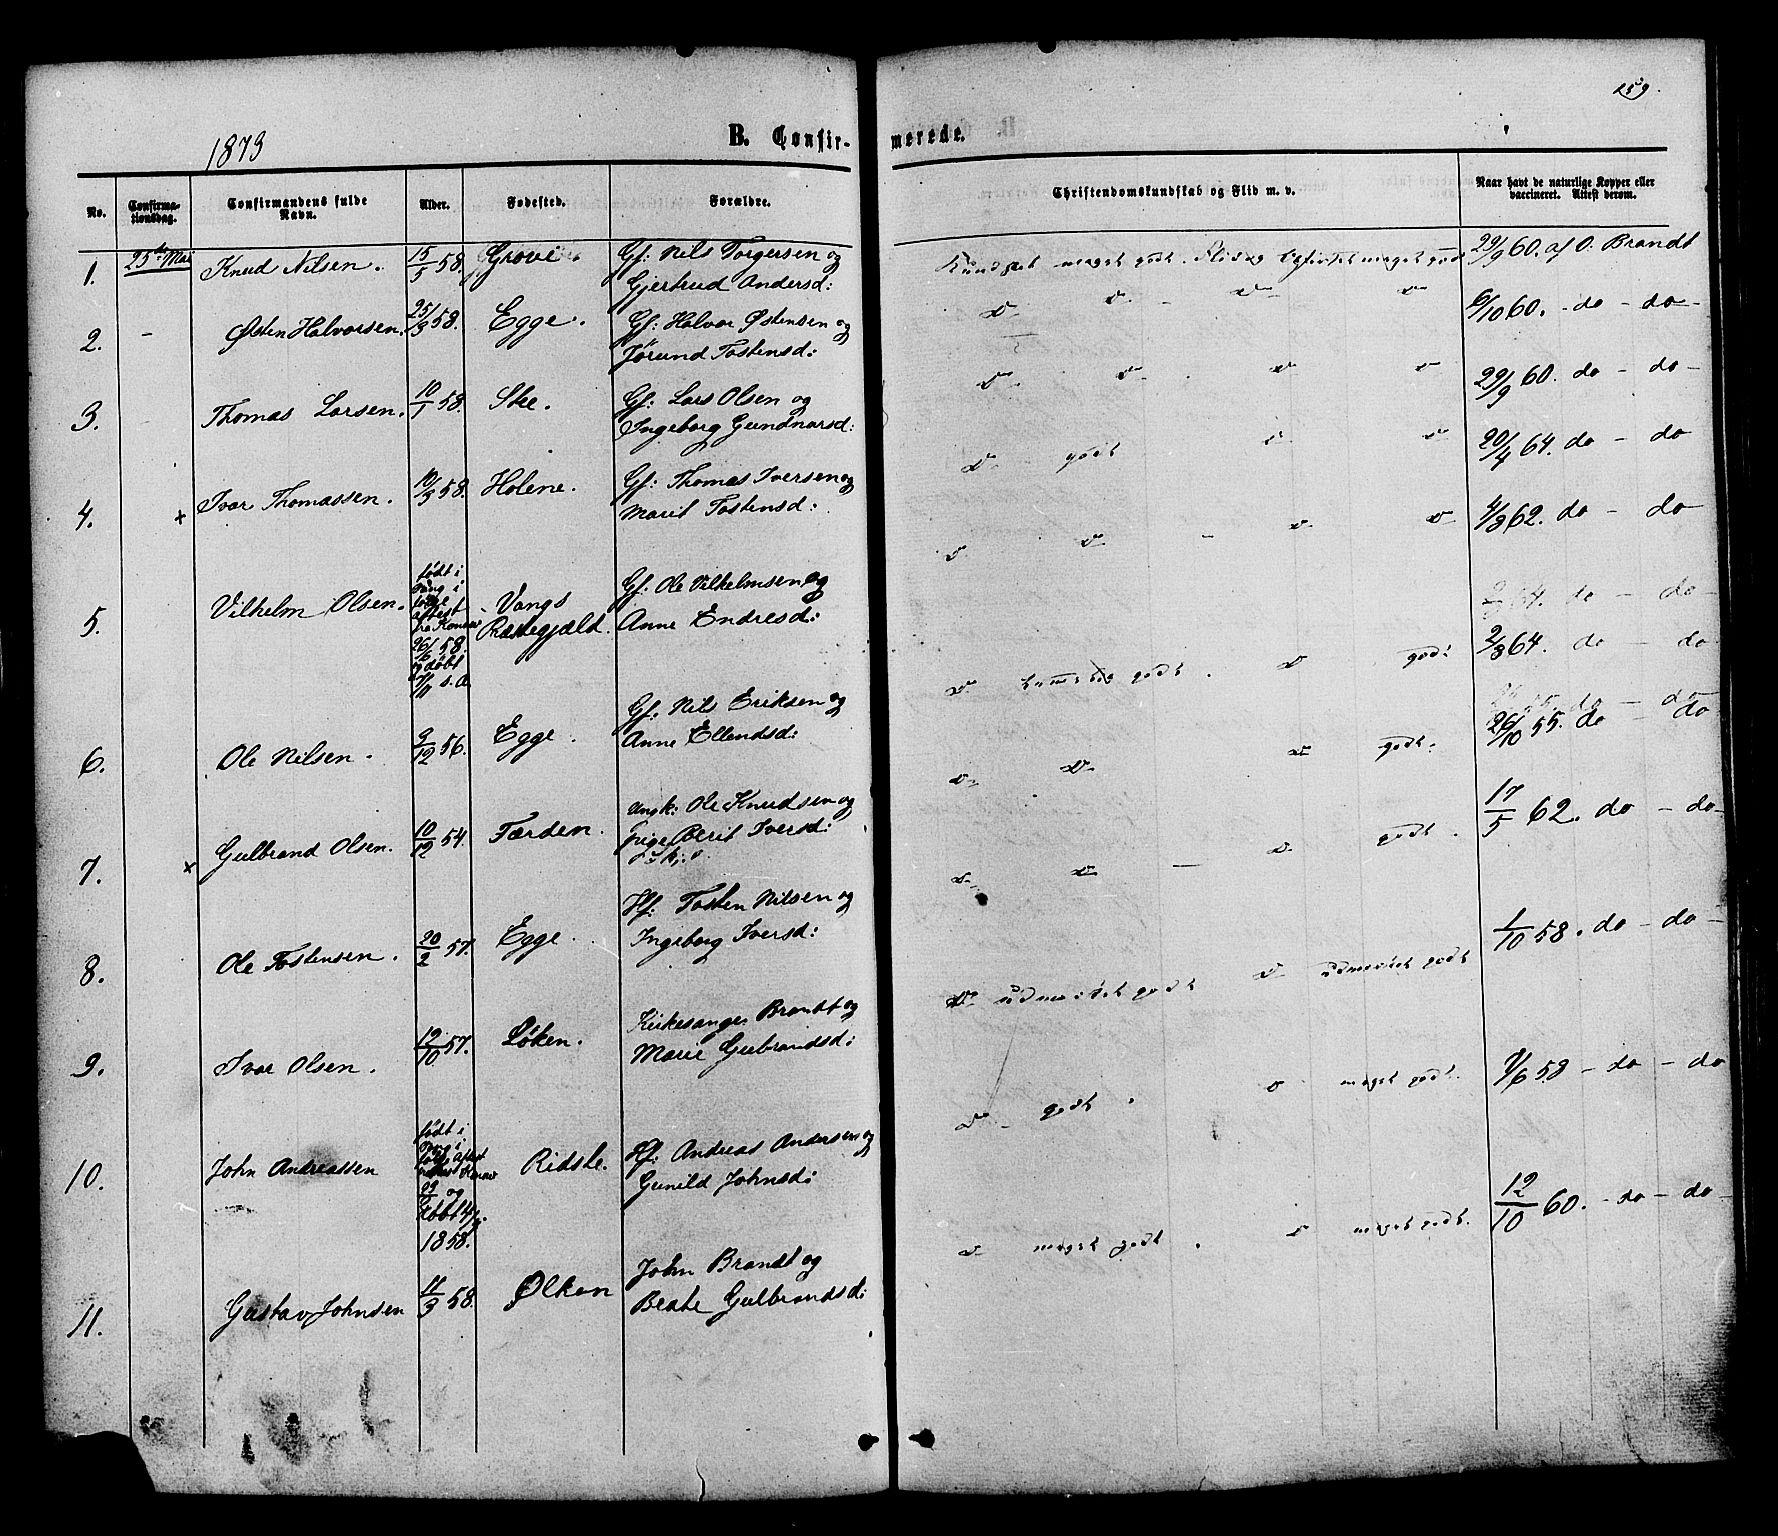 SAH, Vestre Slidre prestekontor, Ministerialbok nr. 3, 1865-1880, s. 159